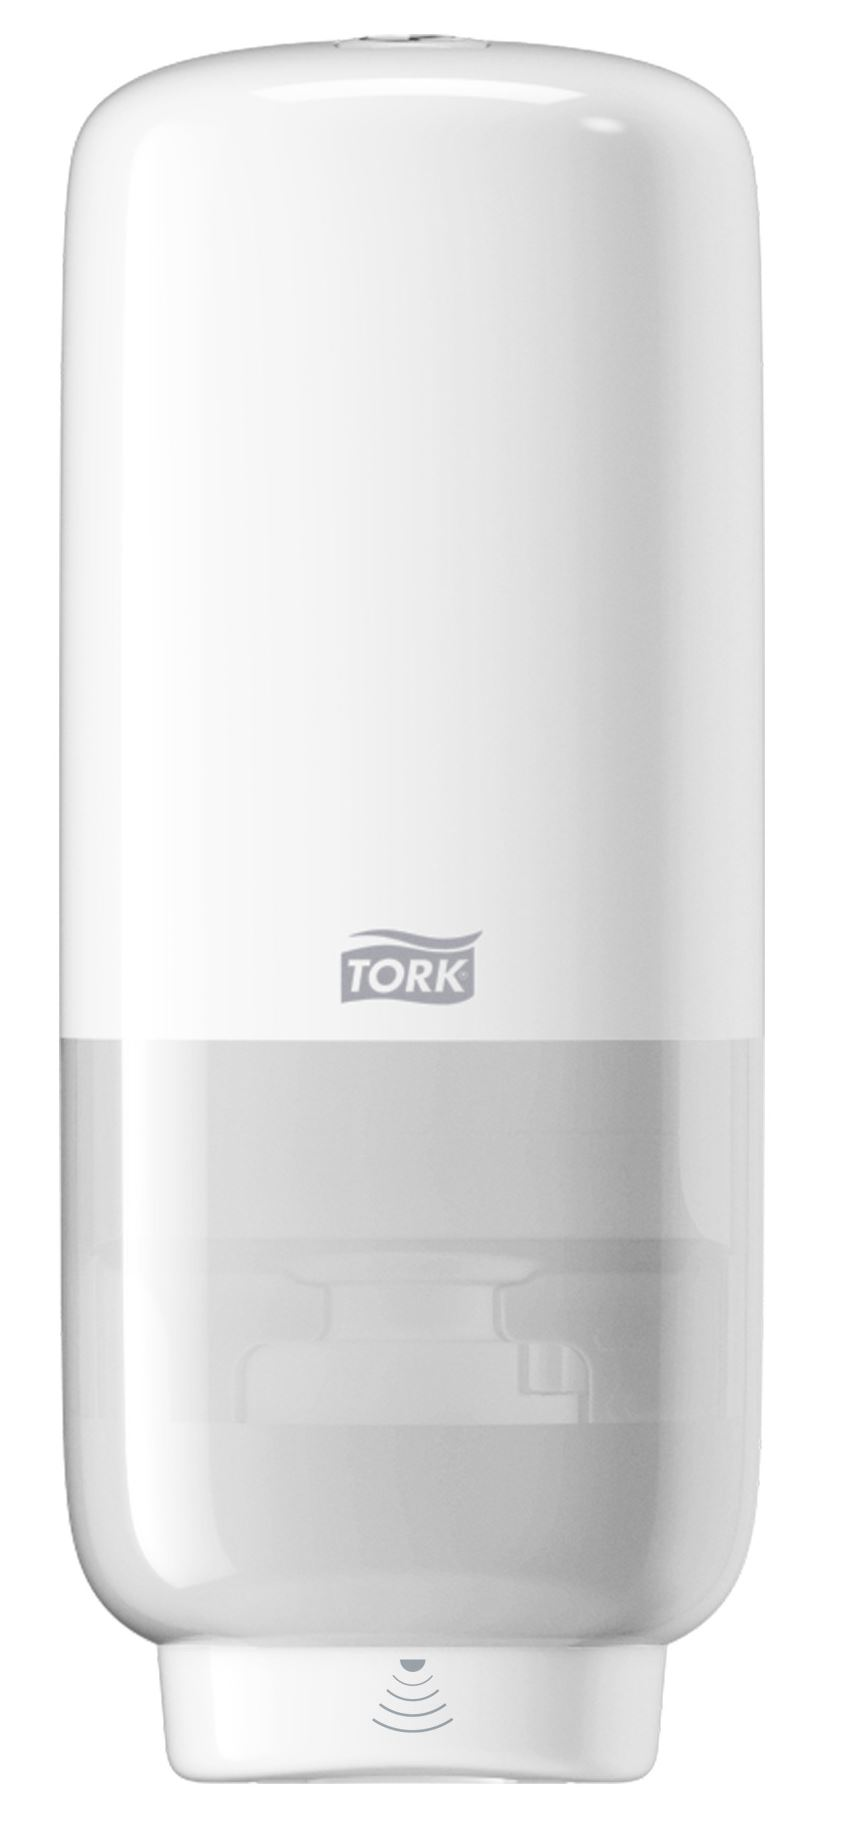 Automatic Soap Dispenser White Tork